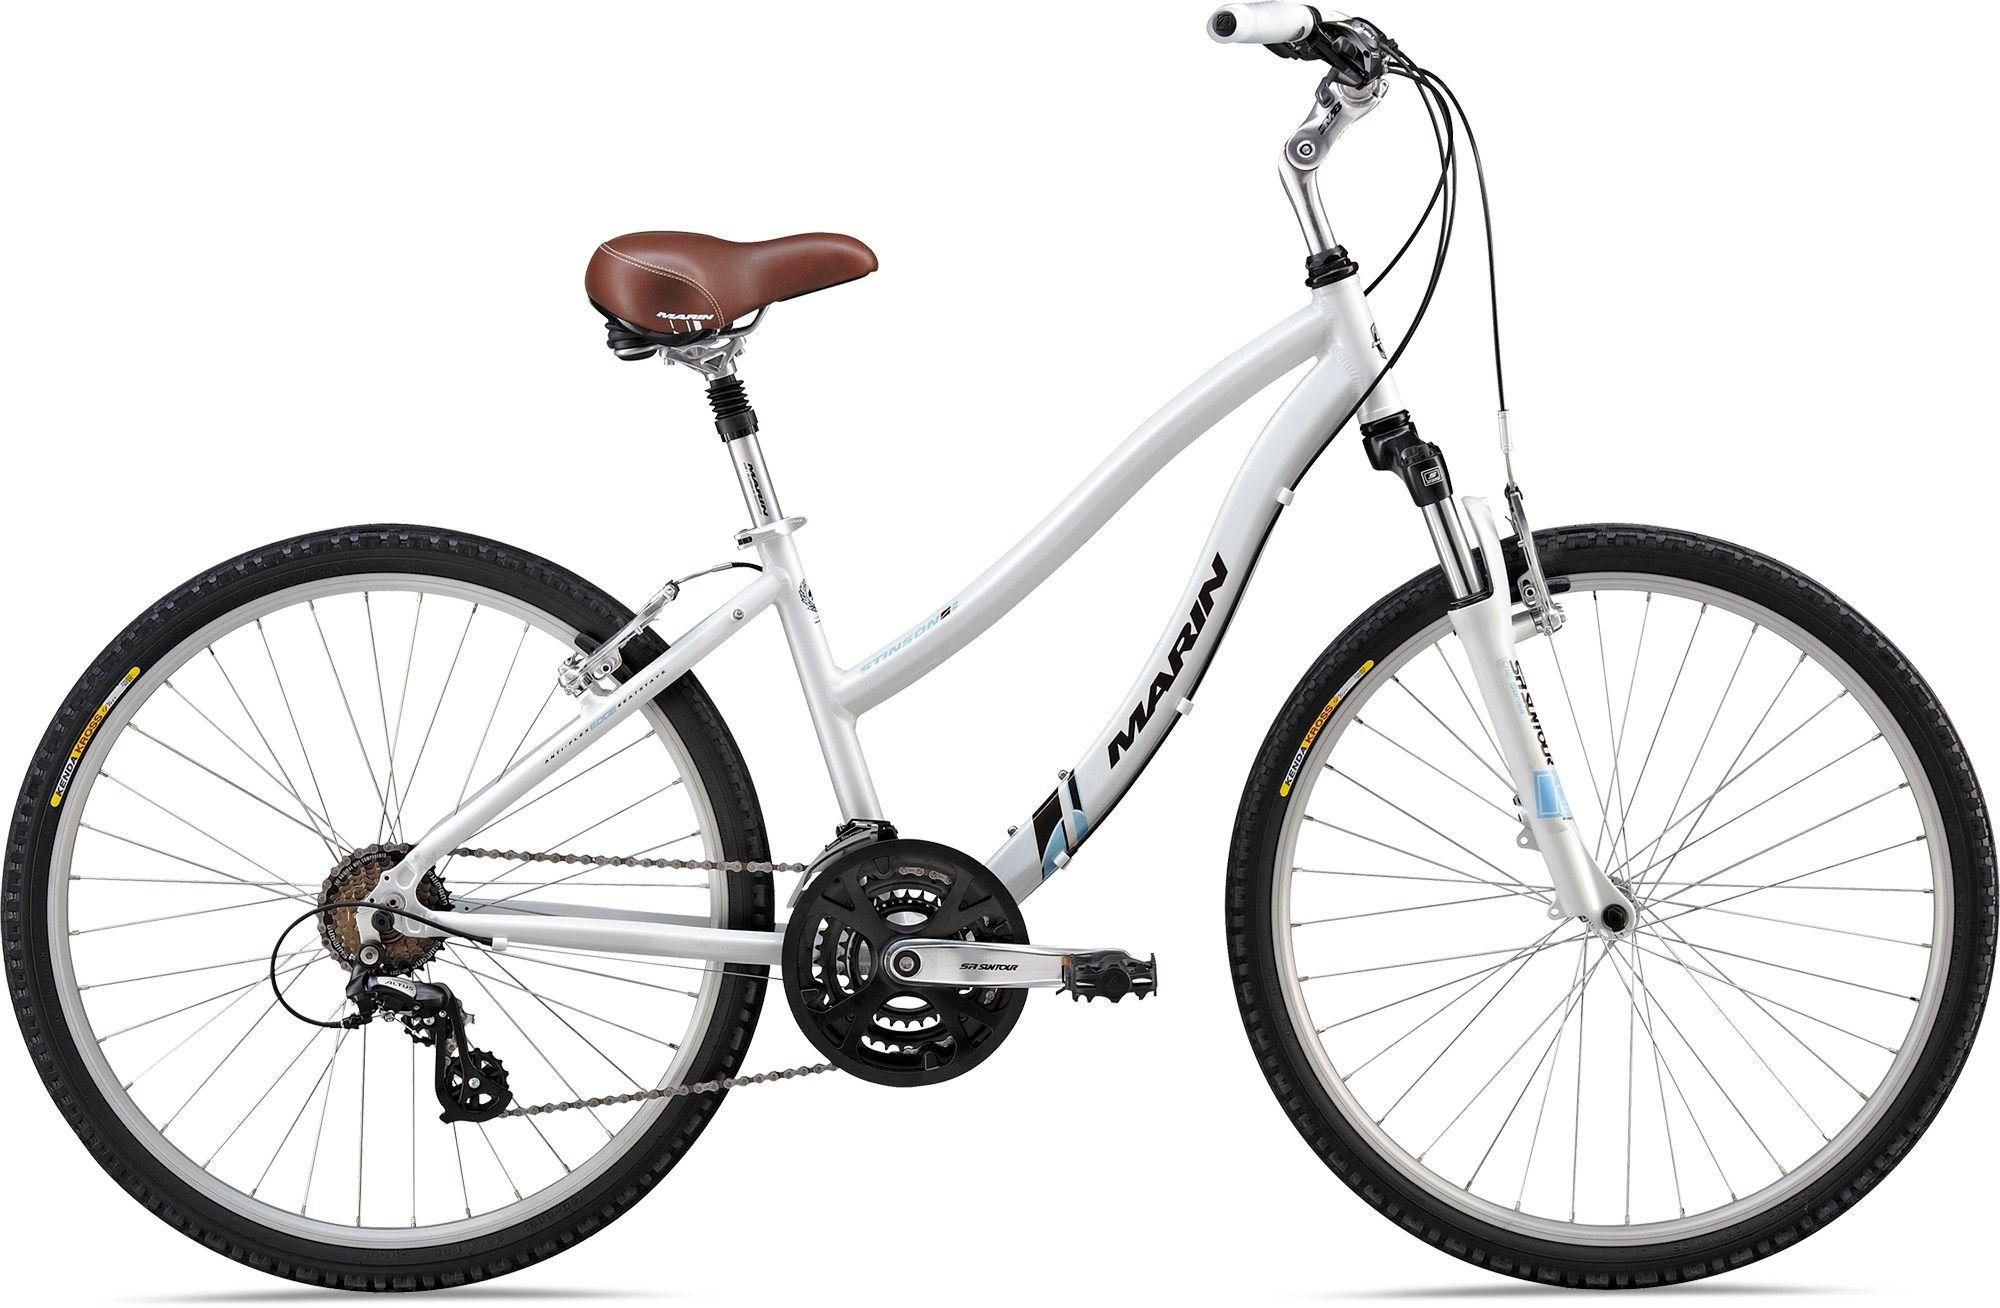 Marin Stinson Women S Bike 2012 Rei Co Op Womens Bike Bike Commuter Bicycle